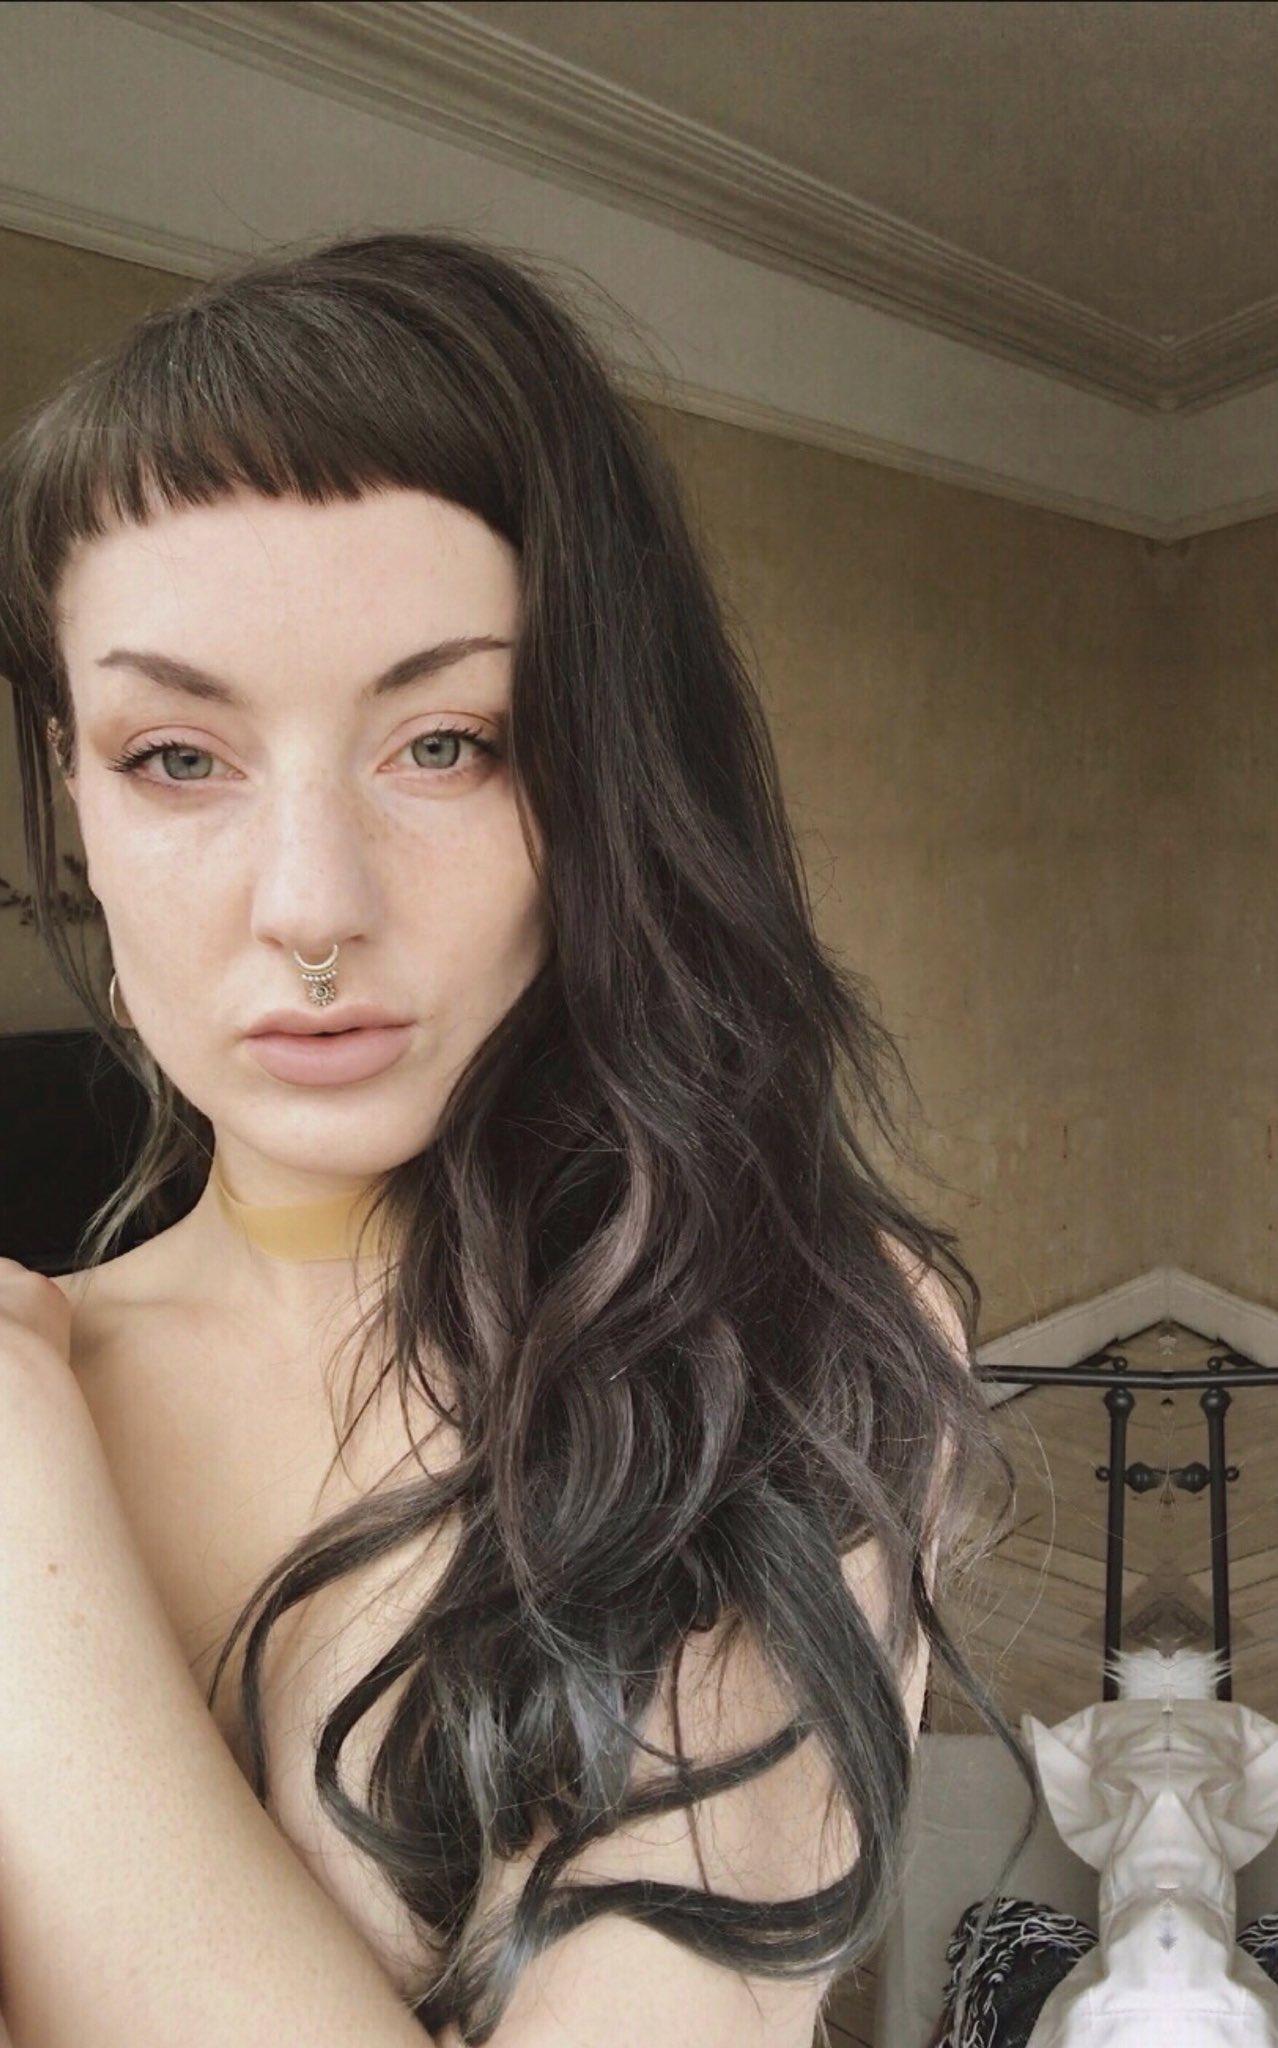 Vex Ashley on Twitter: 🐚 Mermaids…